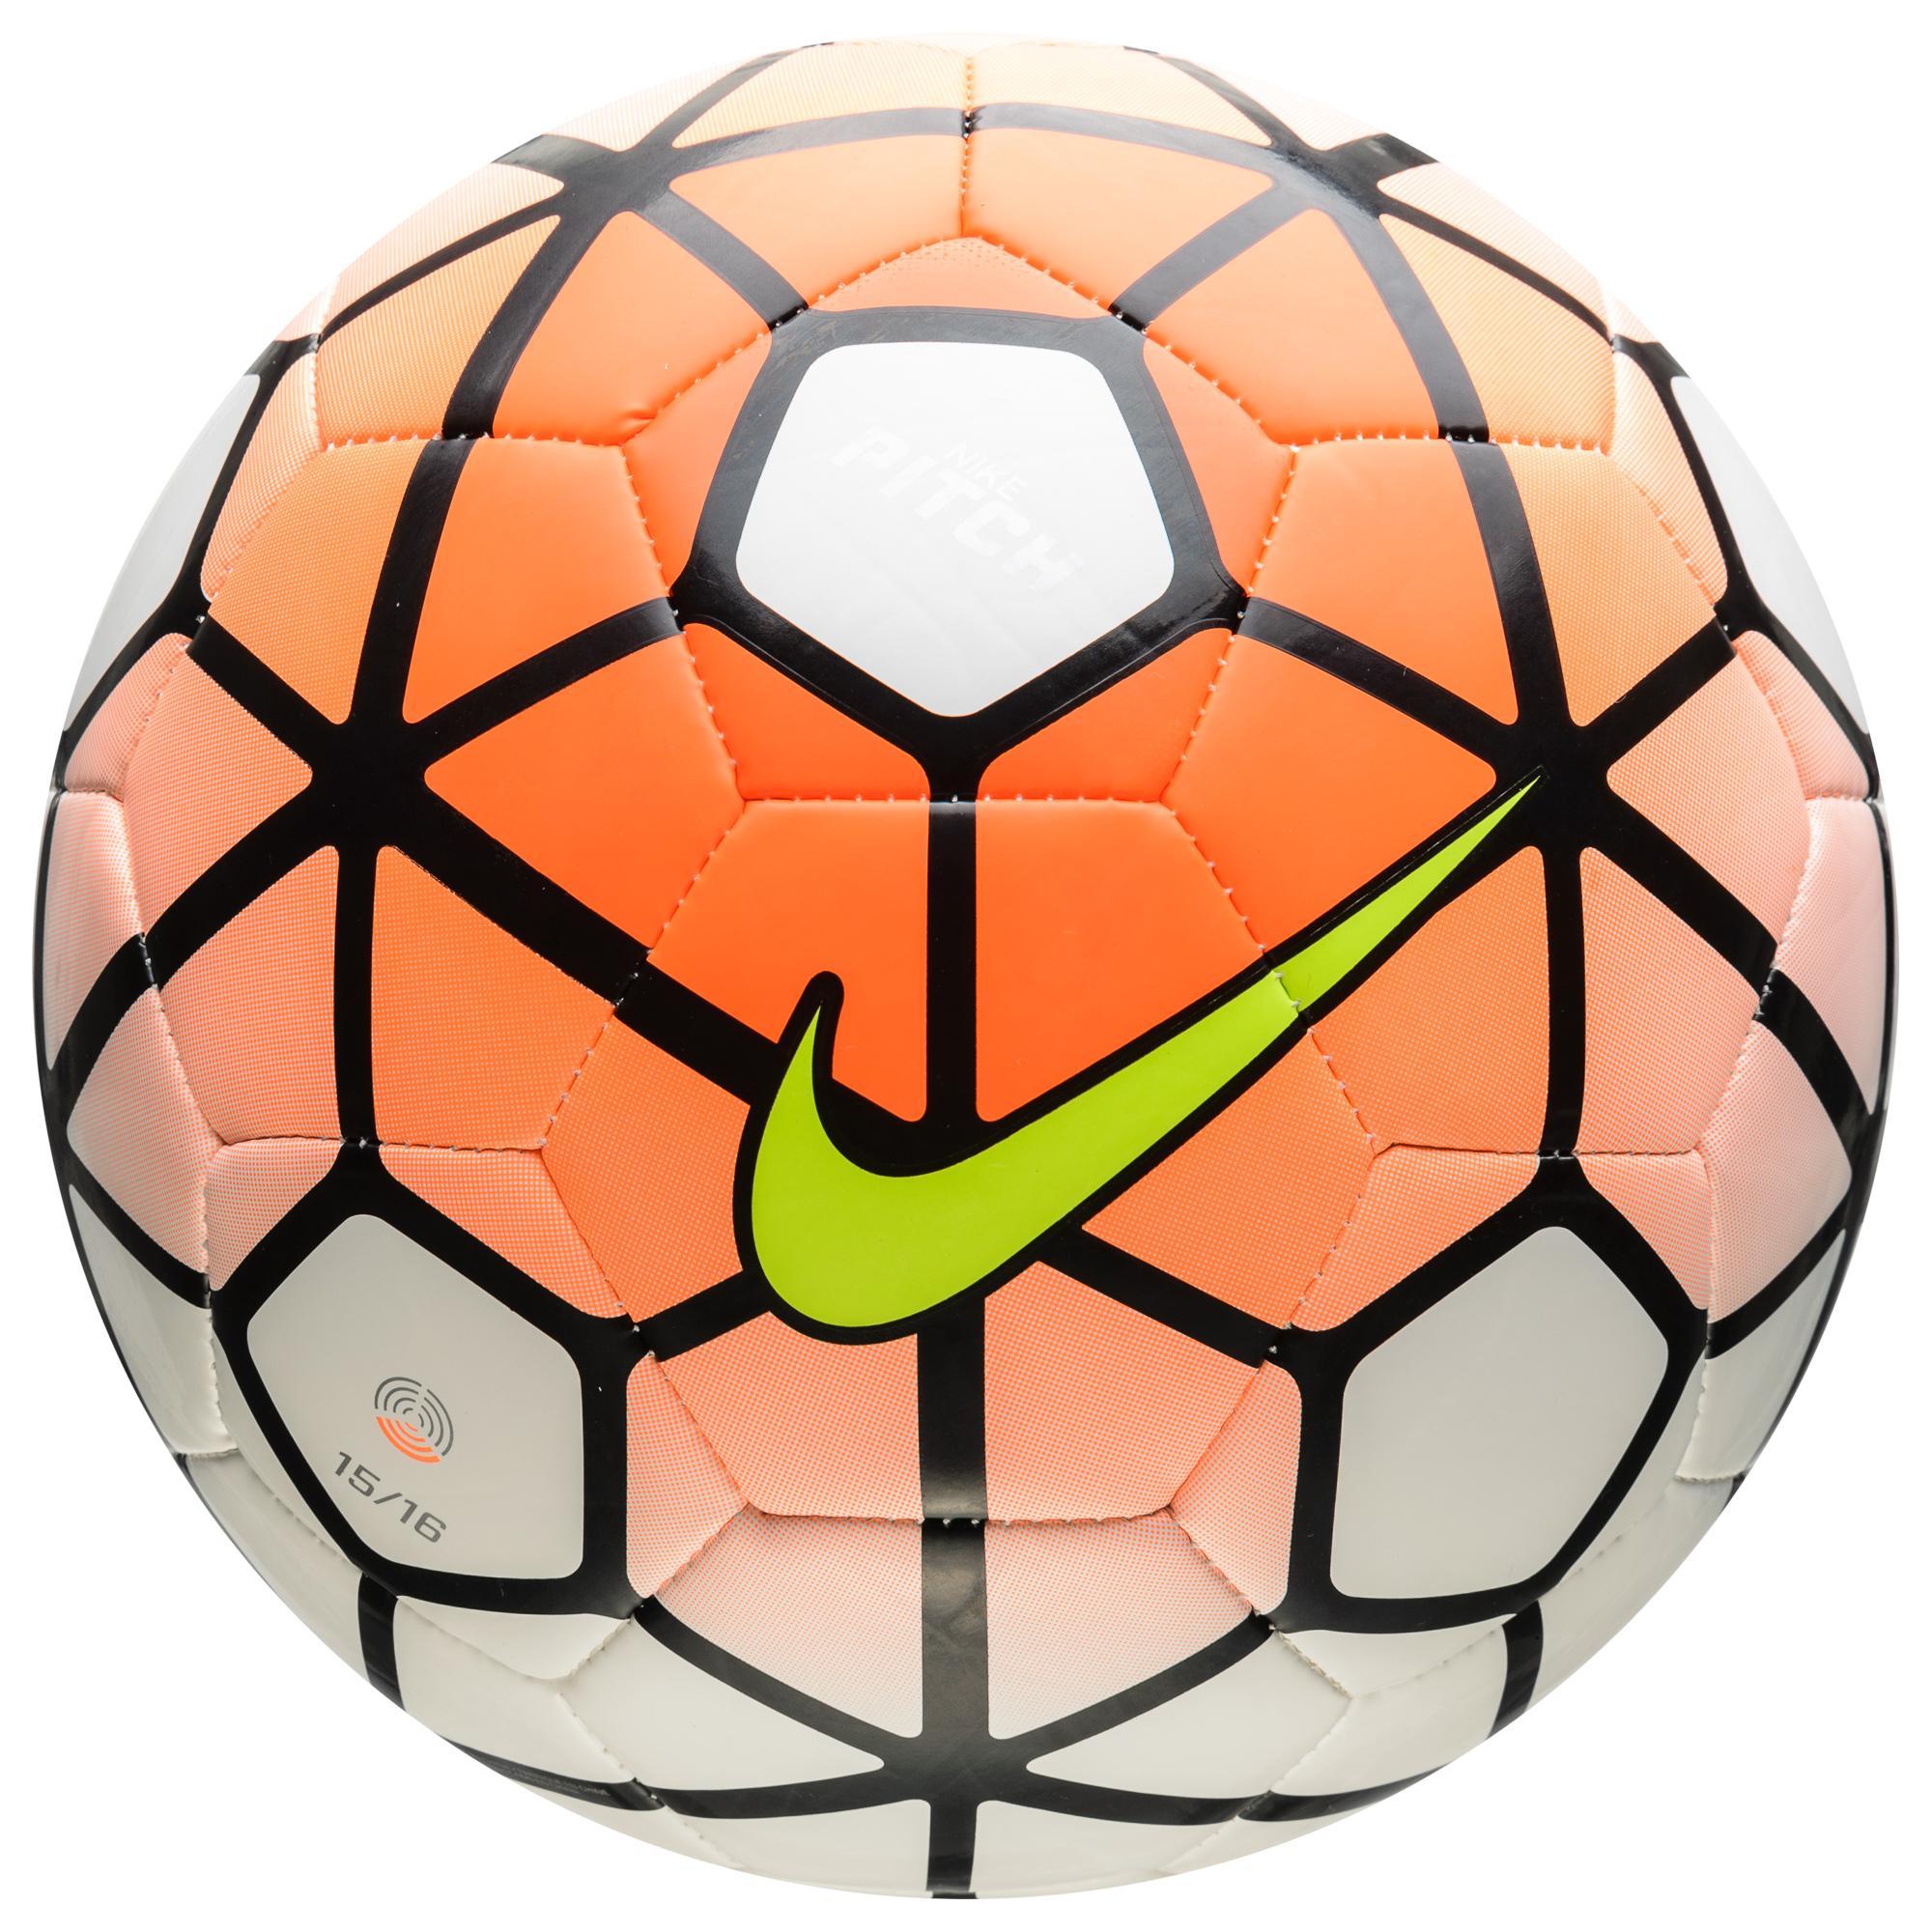 Nike Fotboll Pitch Orange/Vit/Svart